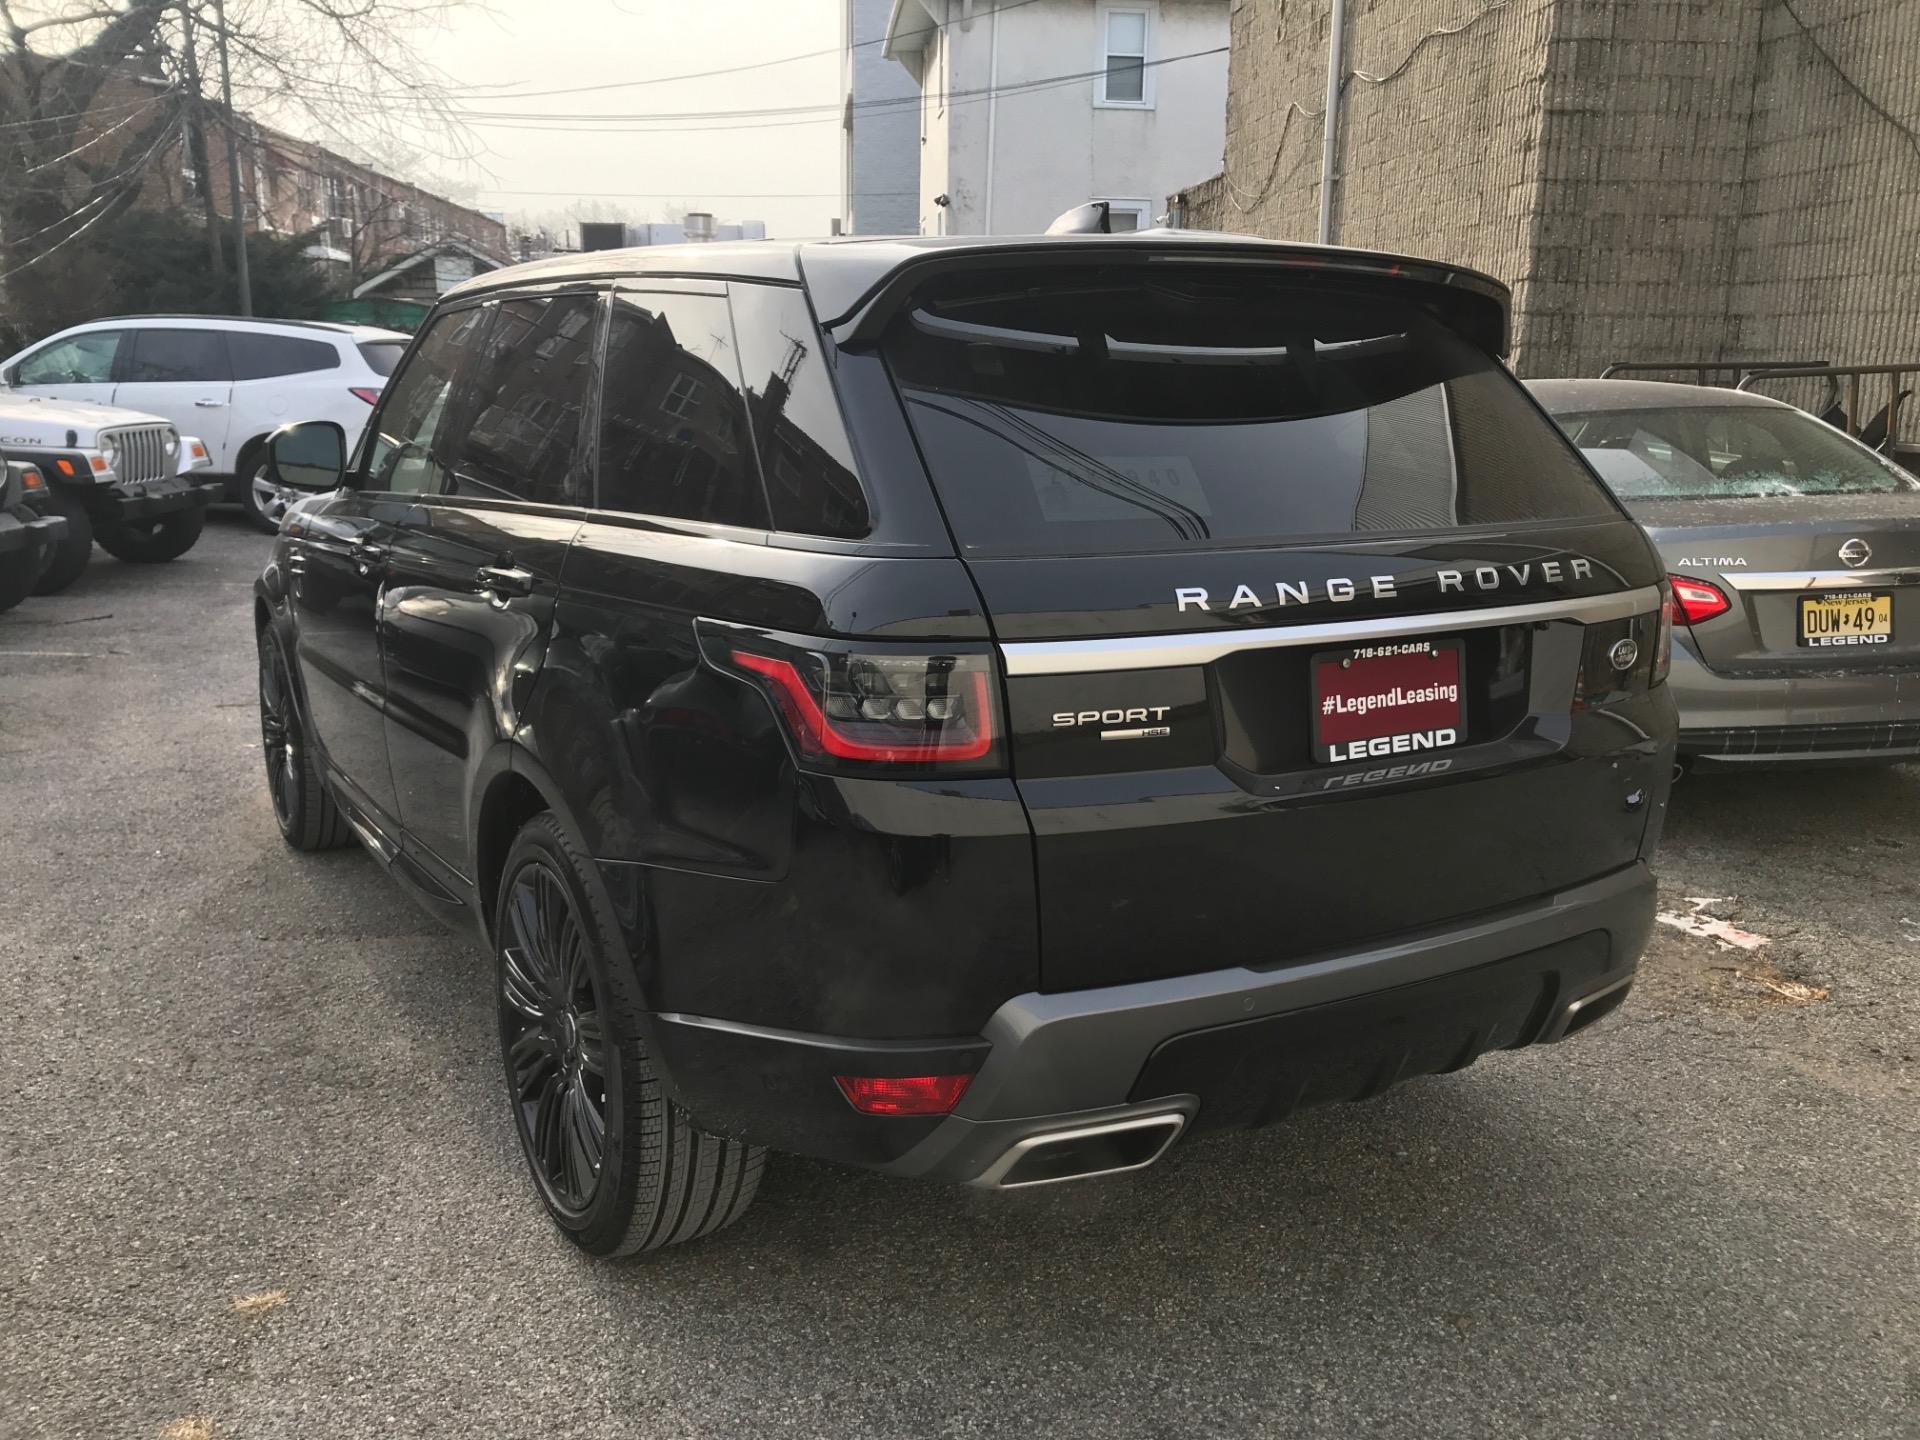 New-2020-Land-Rover-Range-Rover-Sport